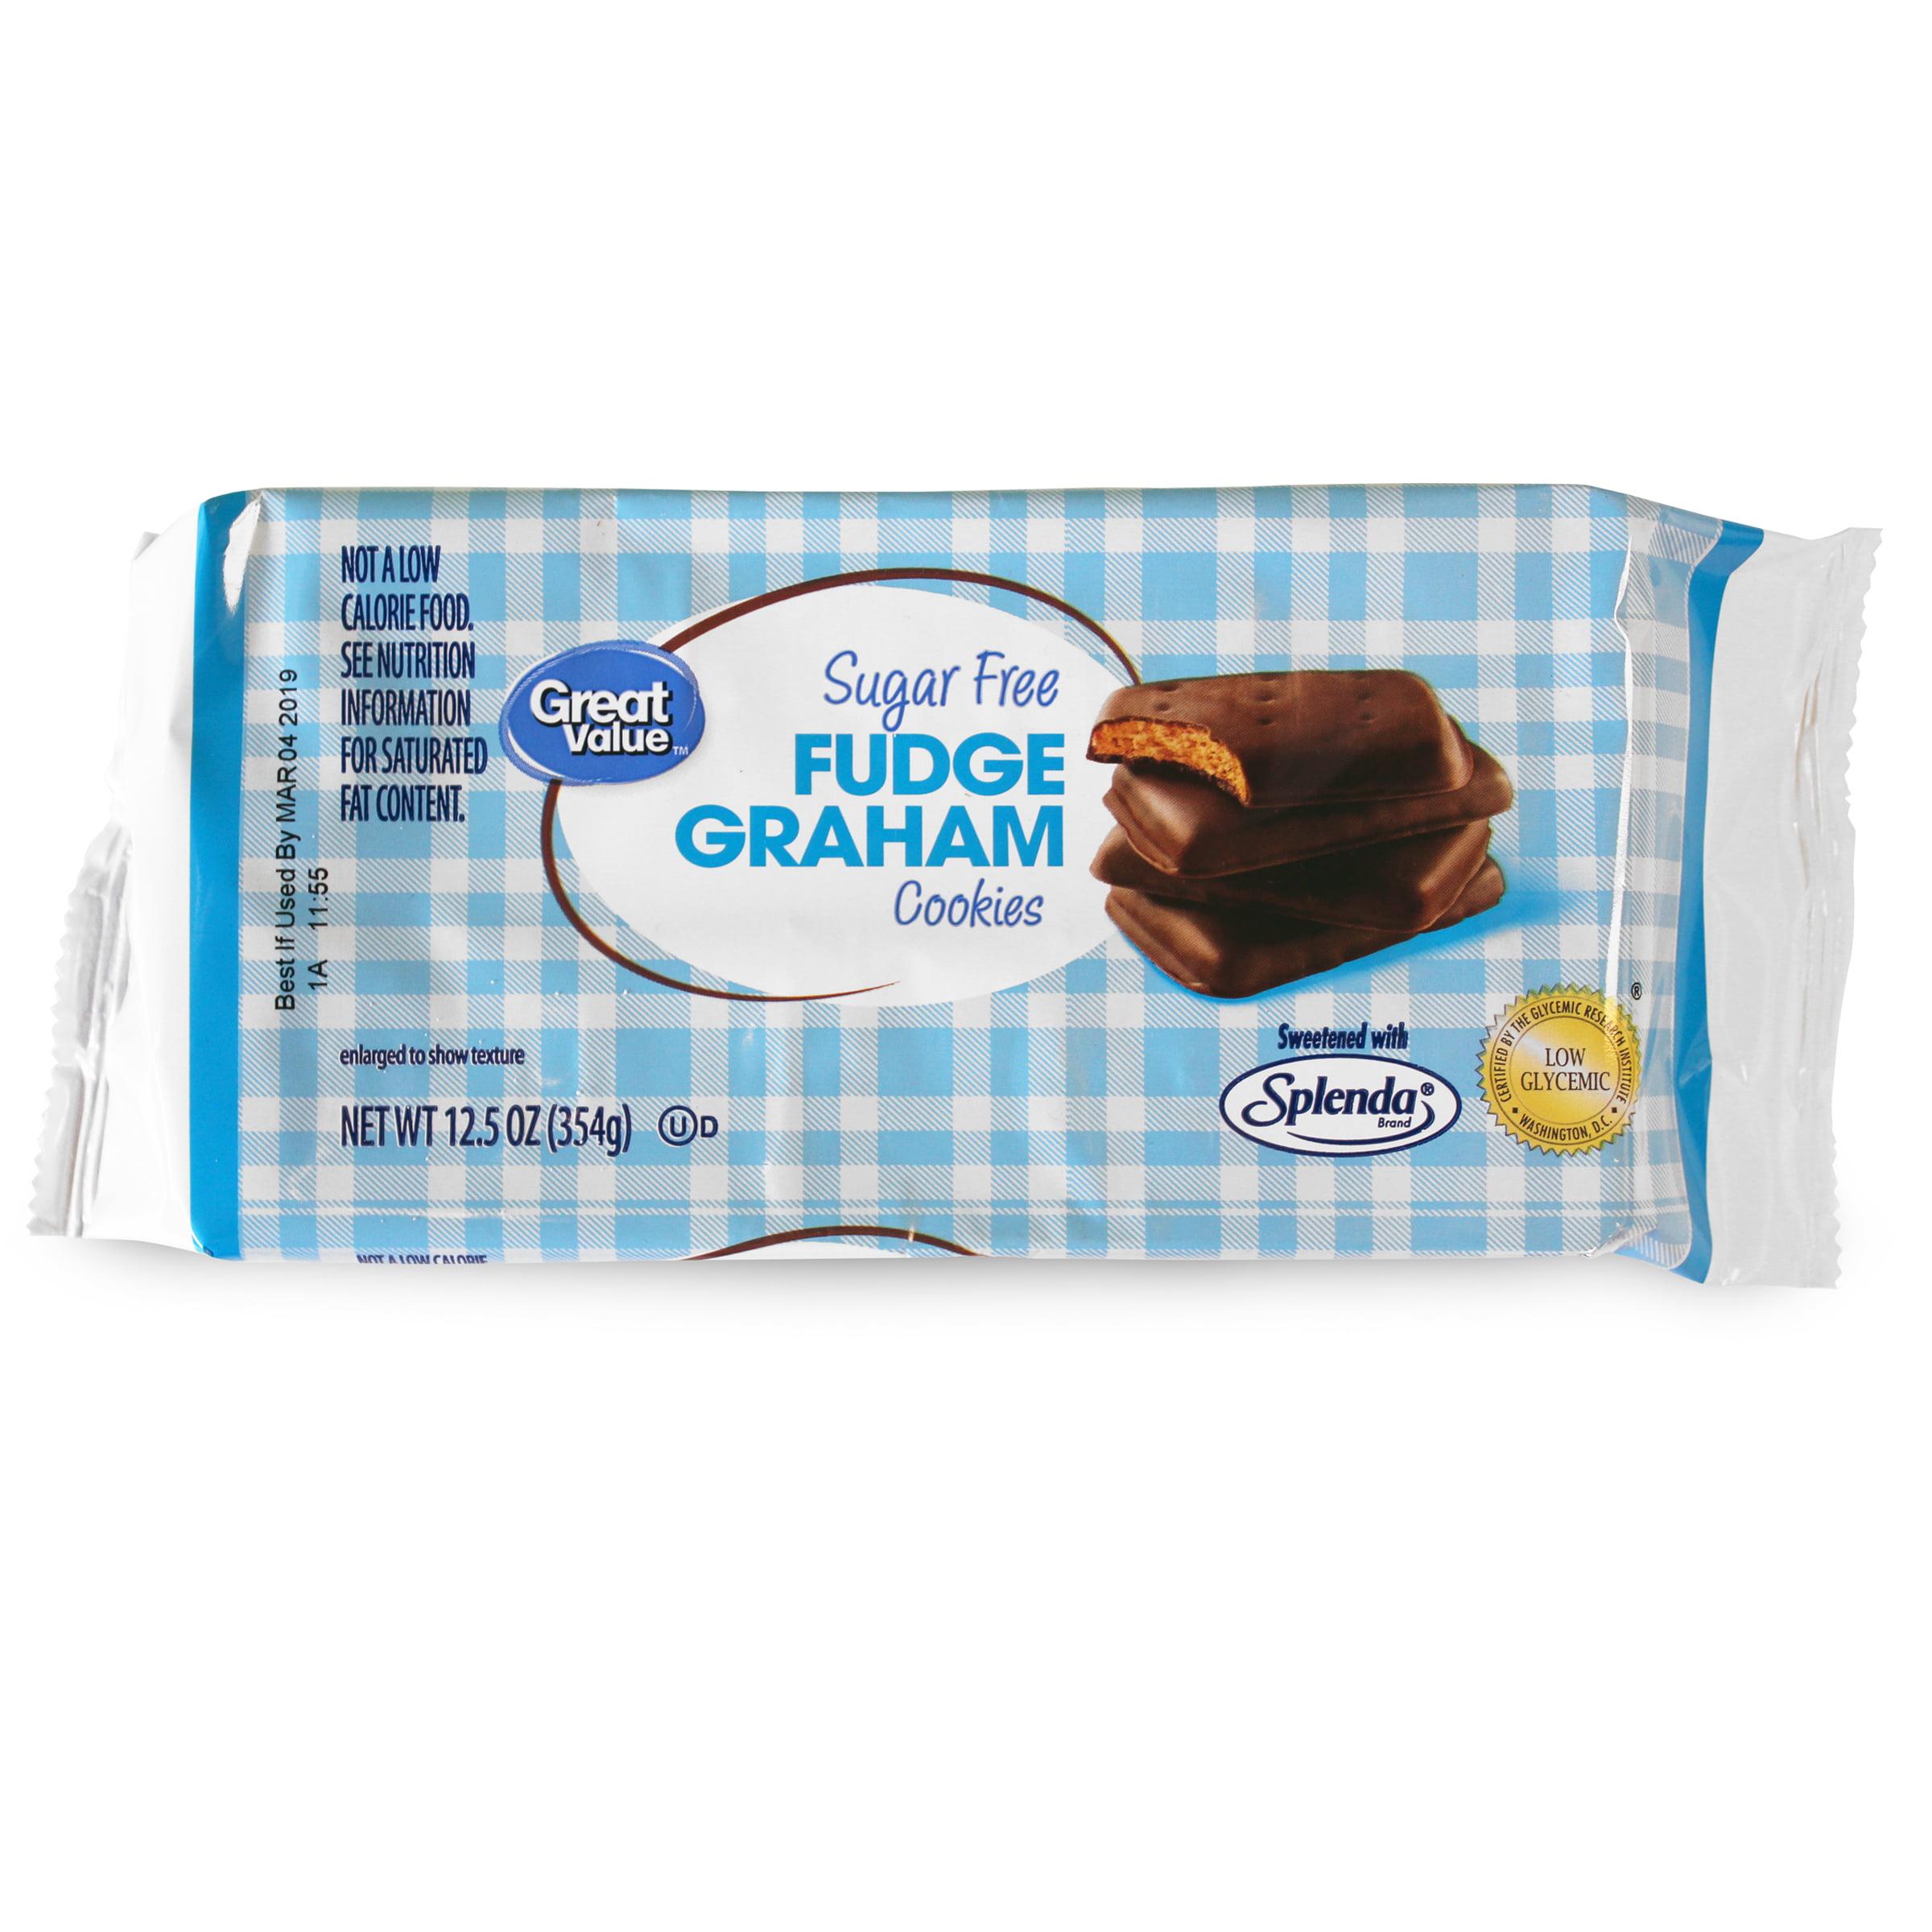 Great Value Fudge Graham Cookies, Sugar Free, 12.5 oz